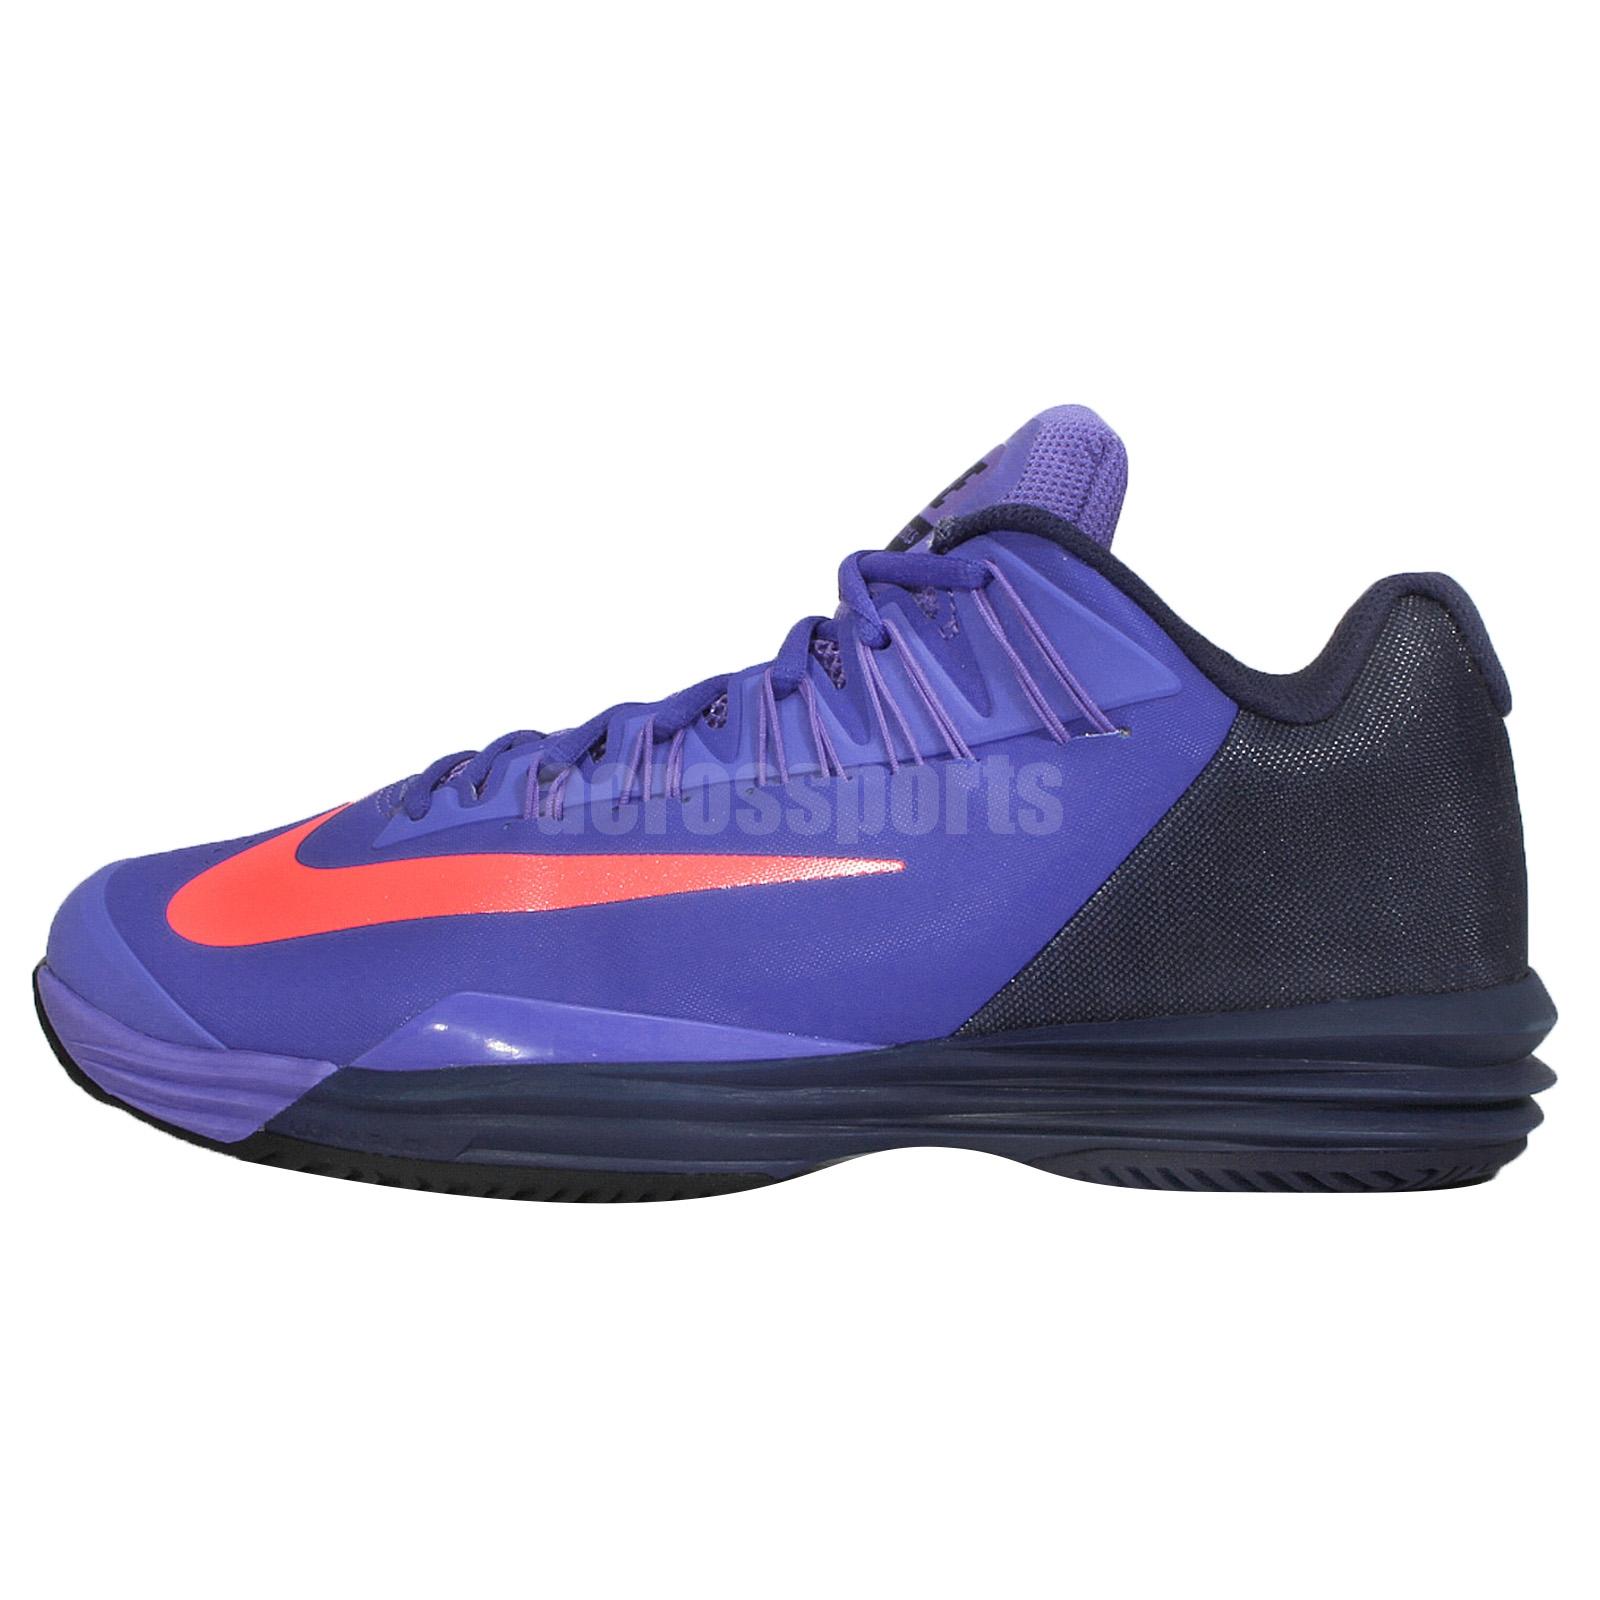 Nike Lunar Ballistec 1.5 XDR Purple Navy Red 2015 Mens Tennis ...